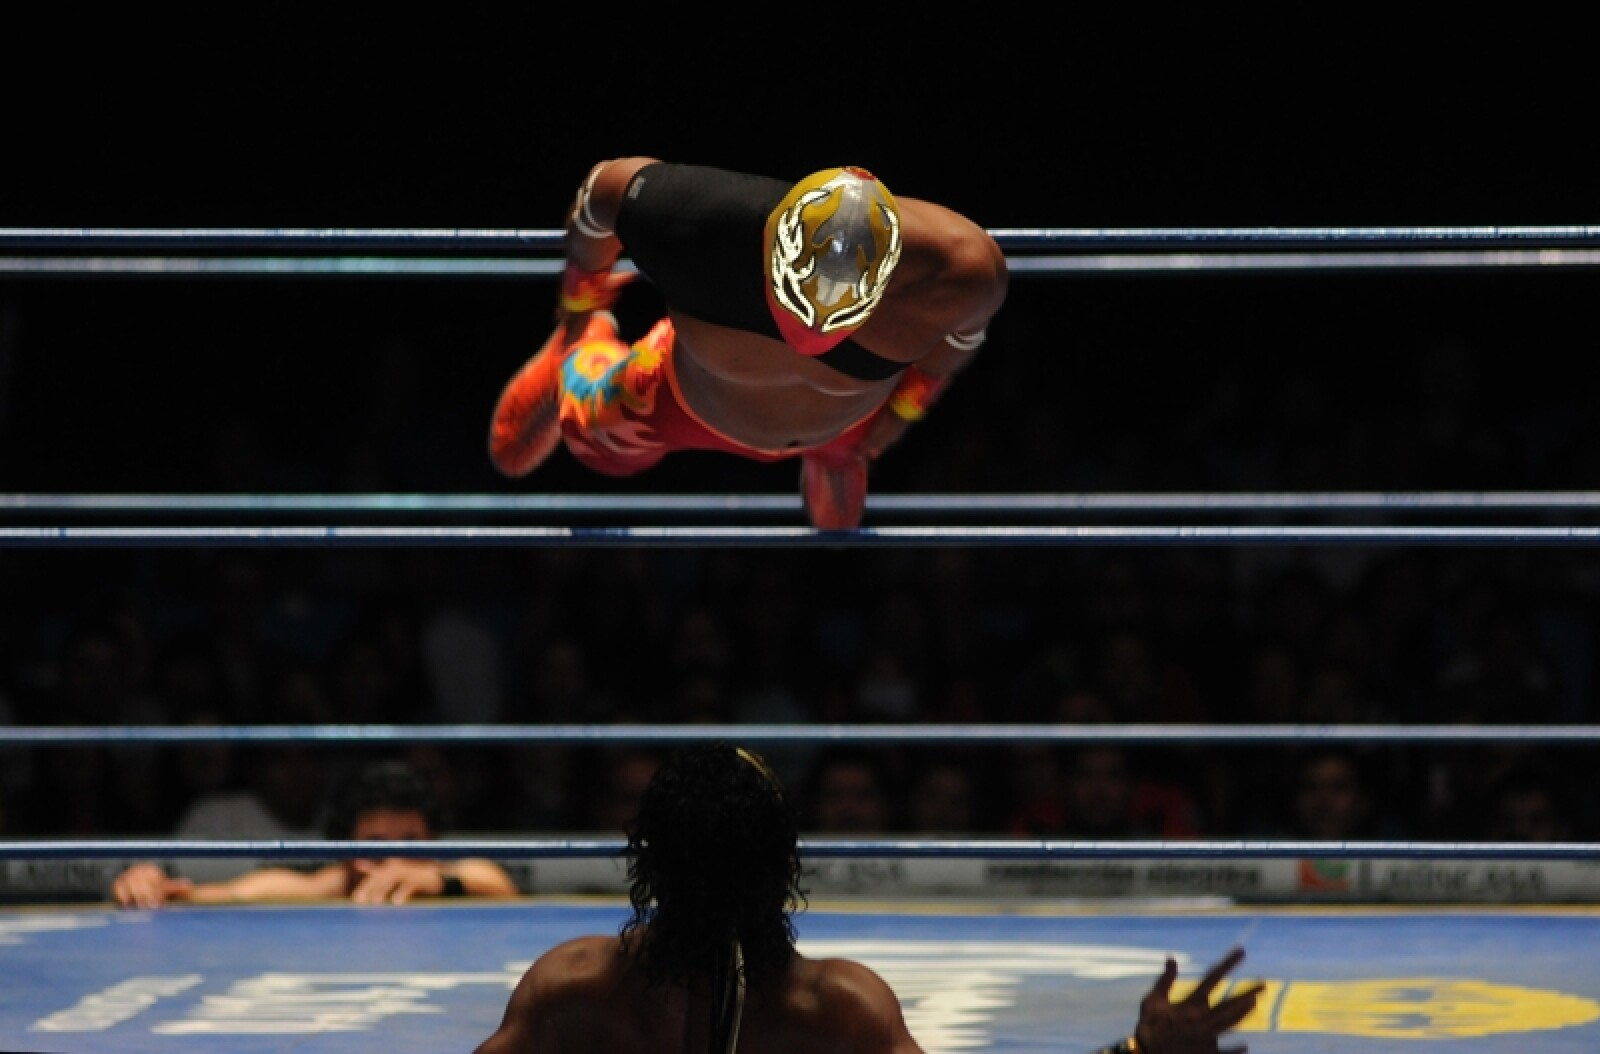 Fuego rey escorpion arena mexico lucha libre